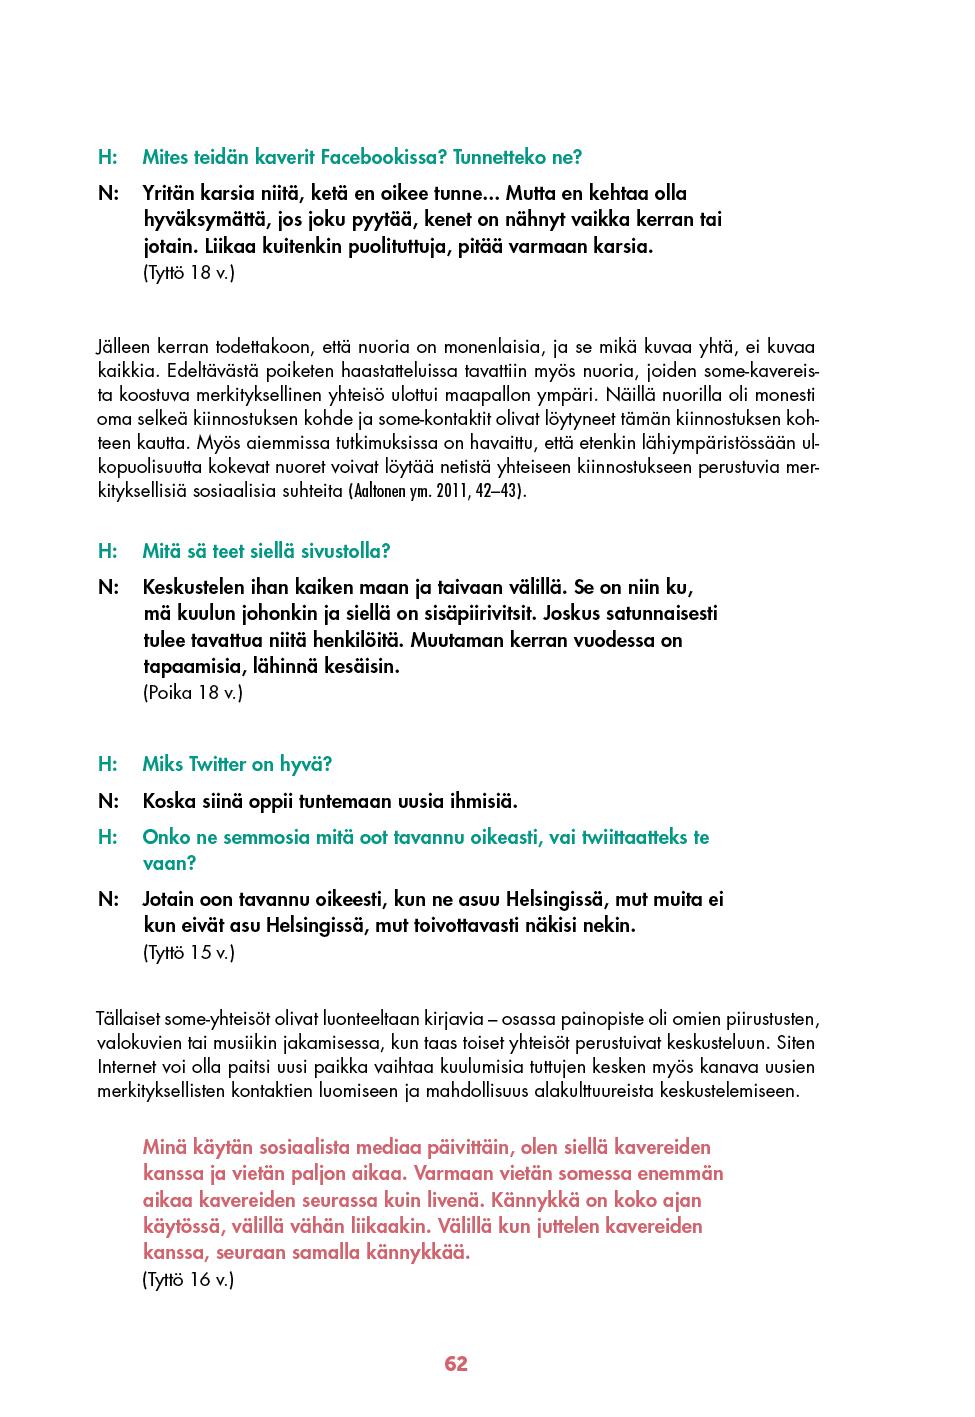 150330_NuHa_raportti_portfolioon_9